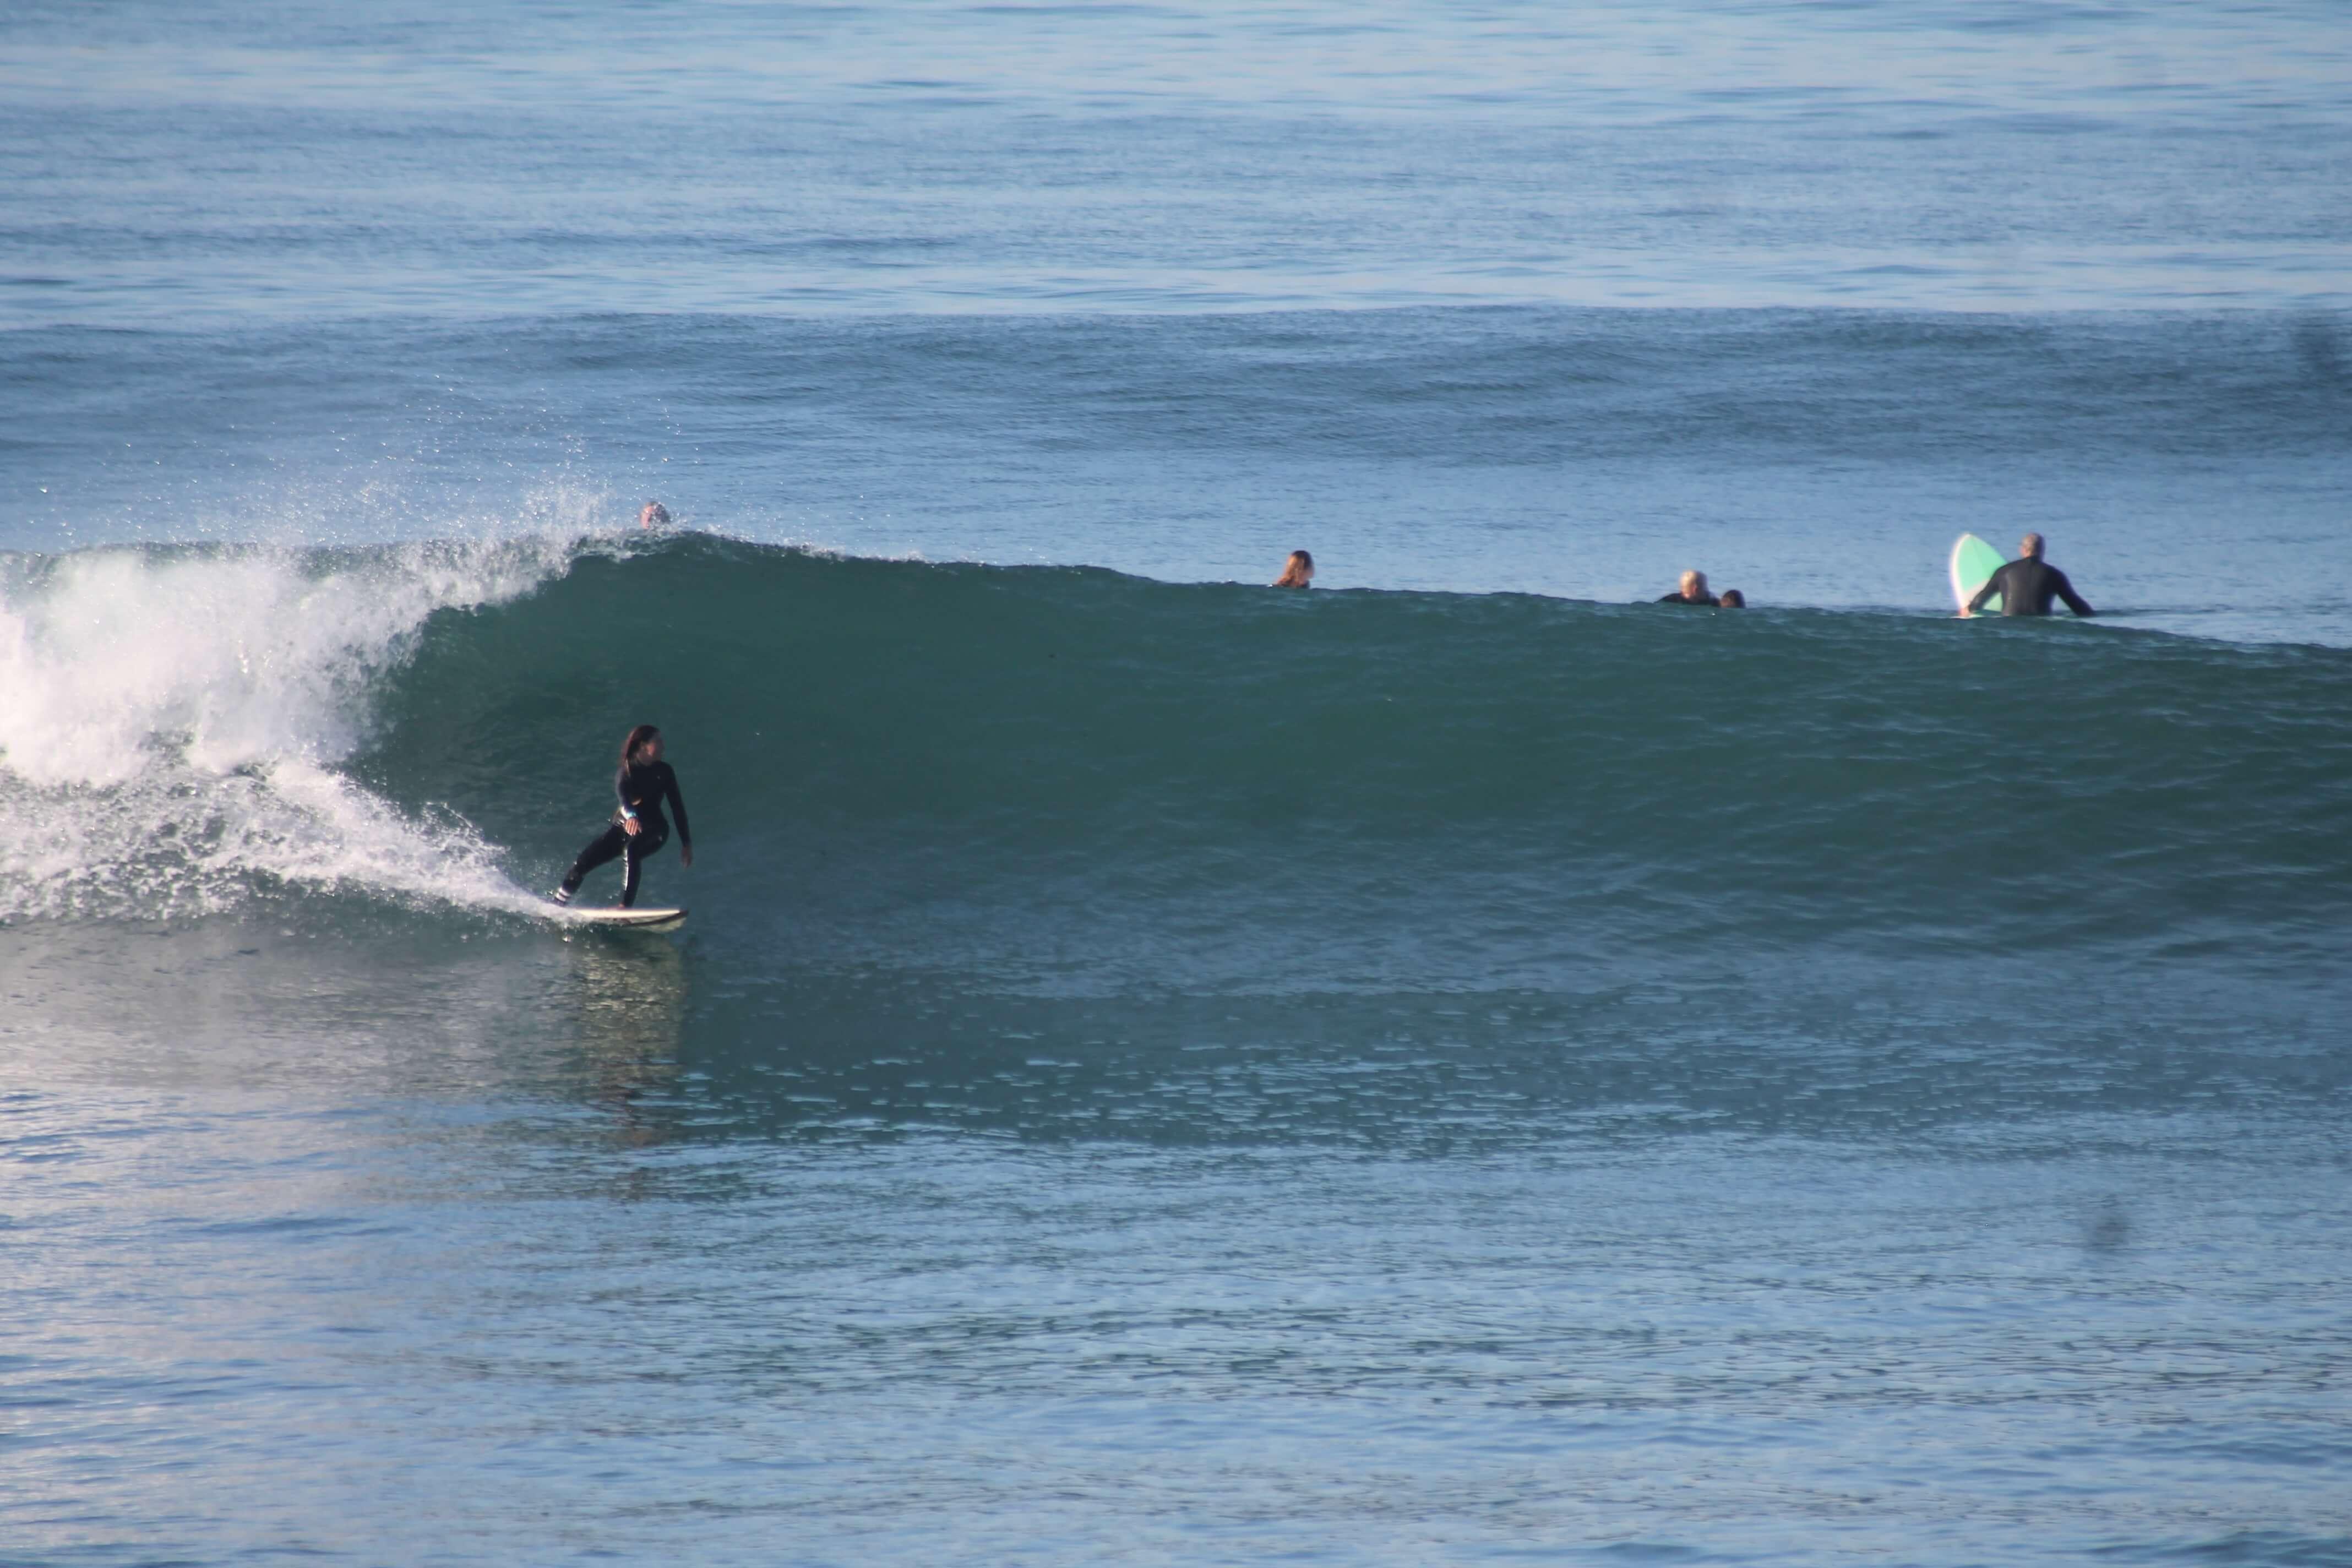 Outdoor adventure in San Diego